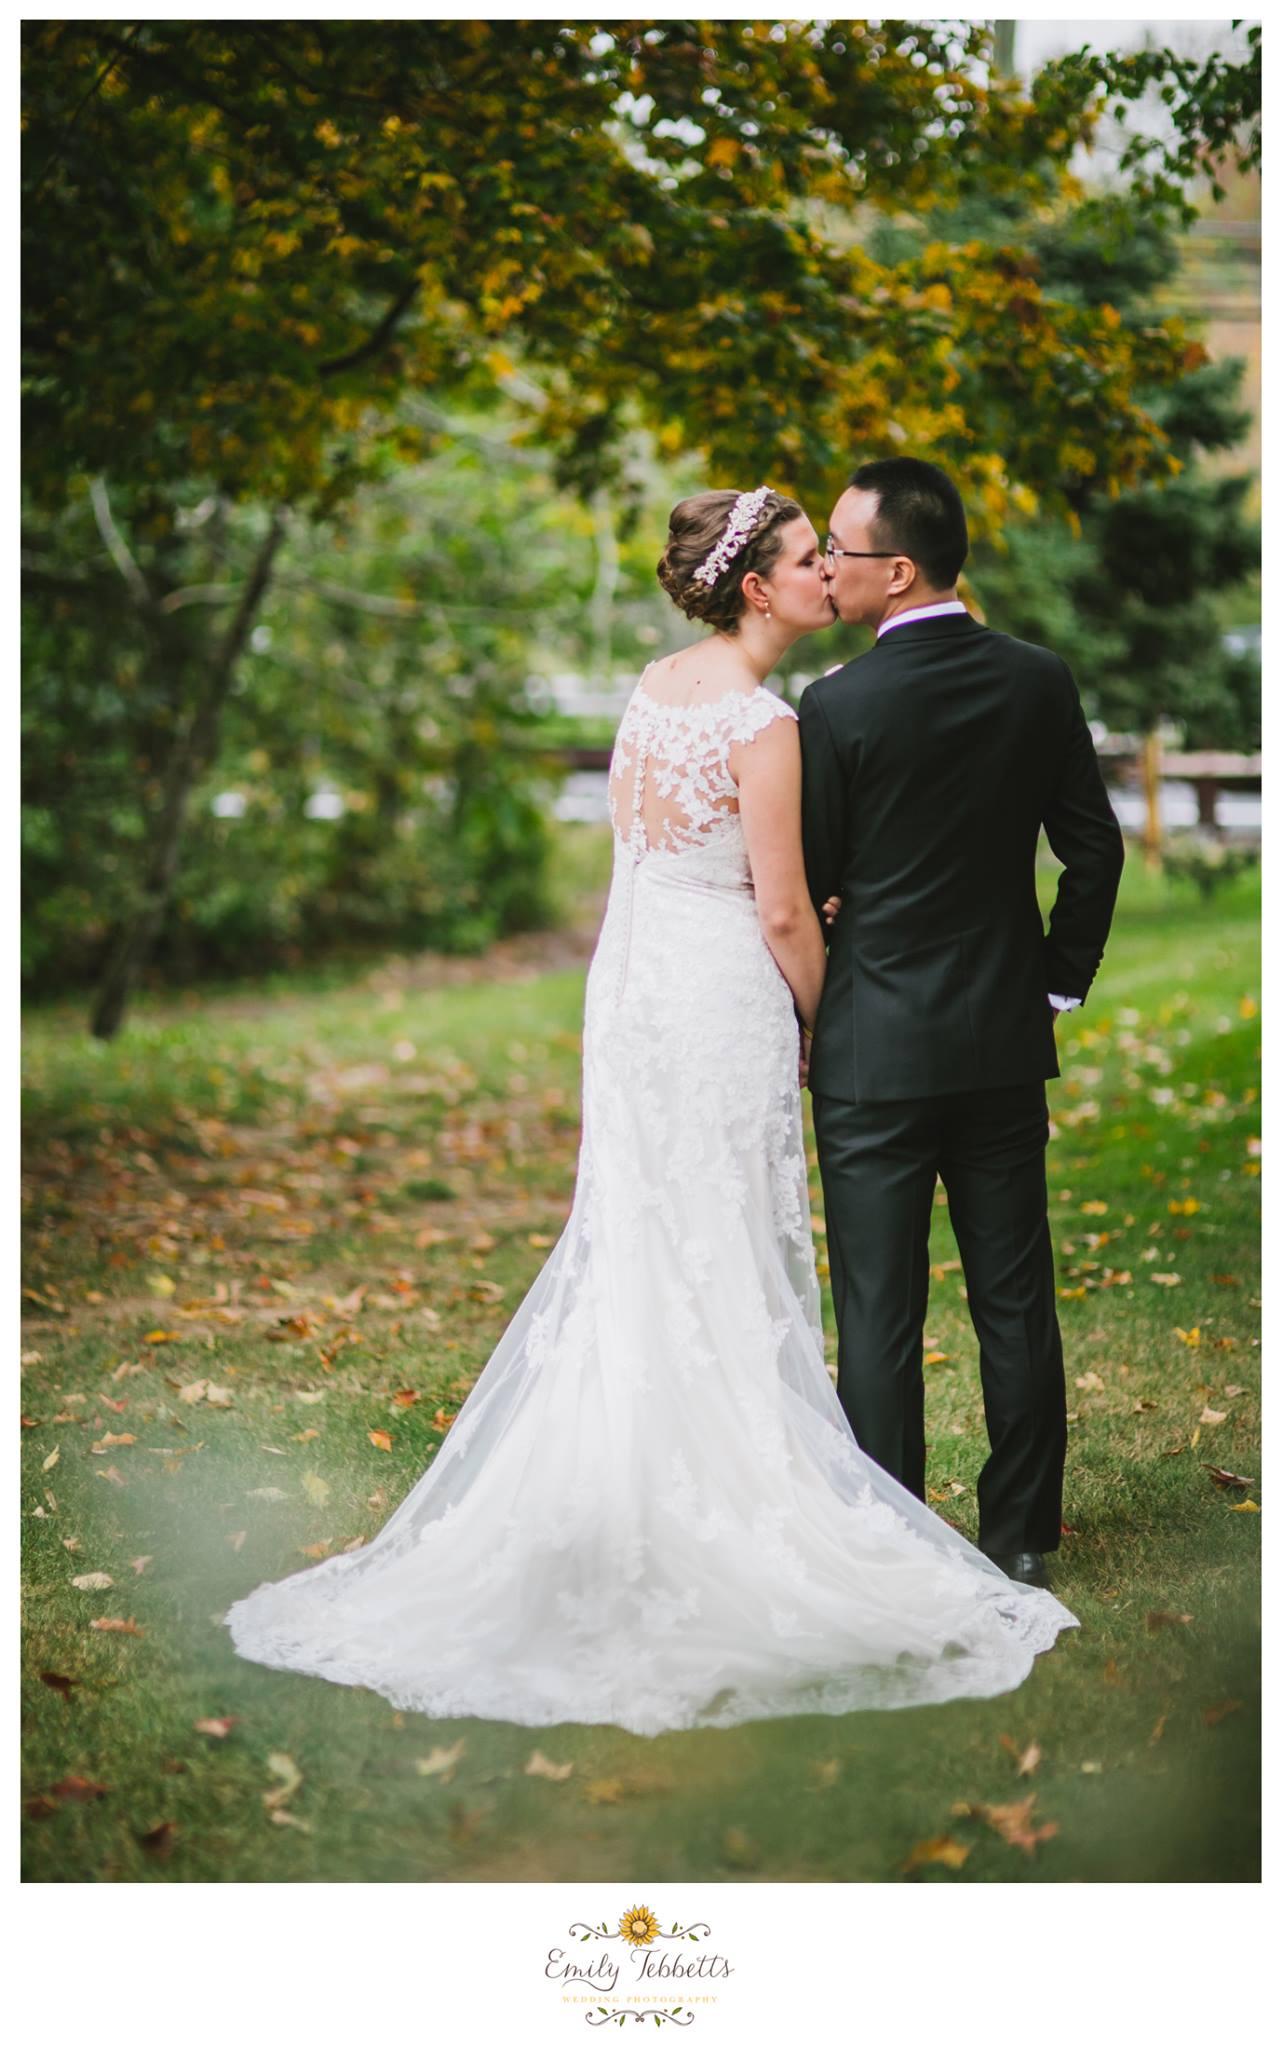 Basking Ridge, NJ - Emily Tebbetts Wedding Photography 4.jpg